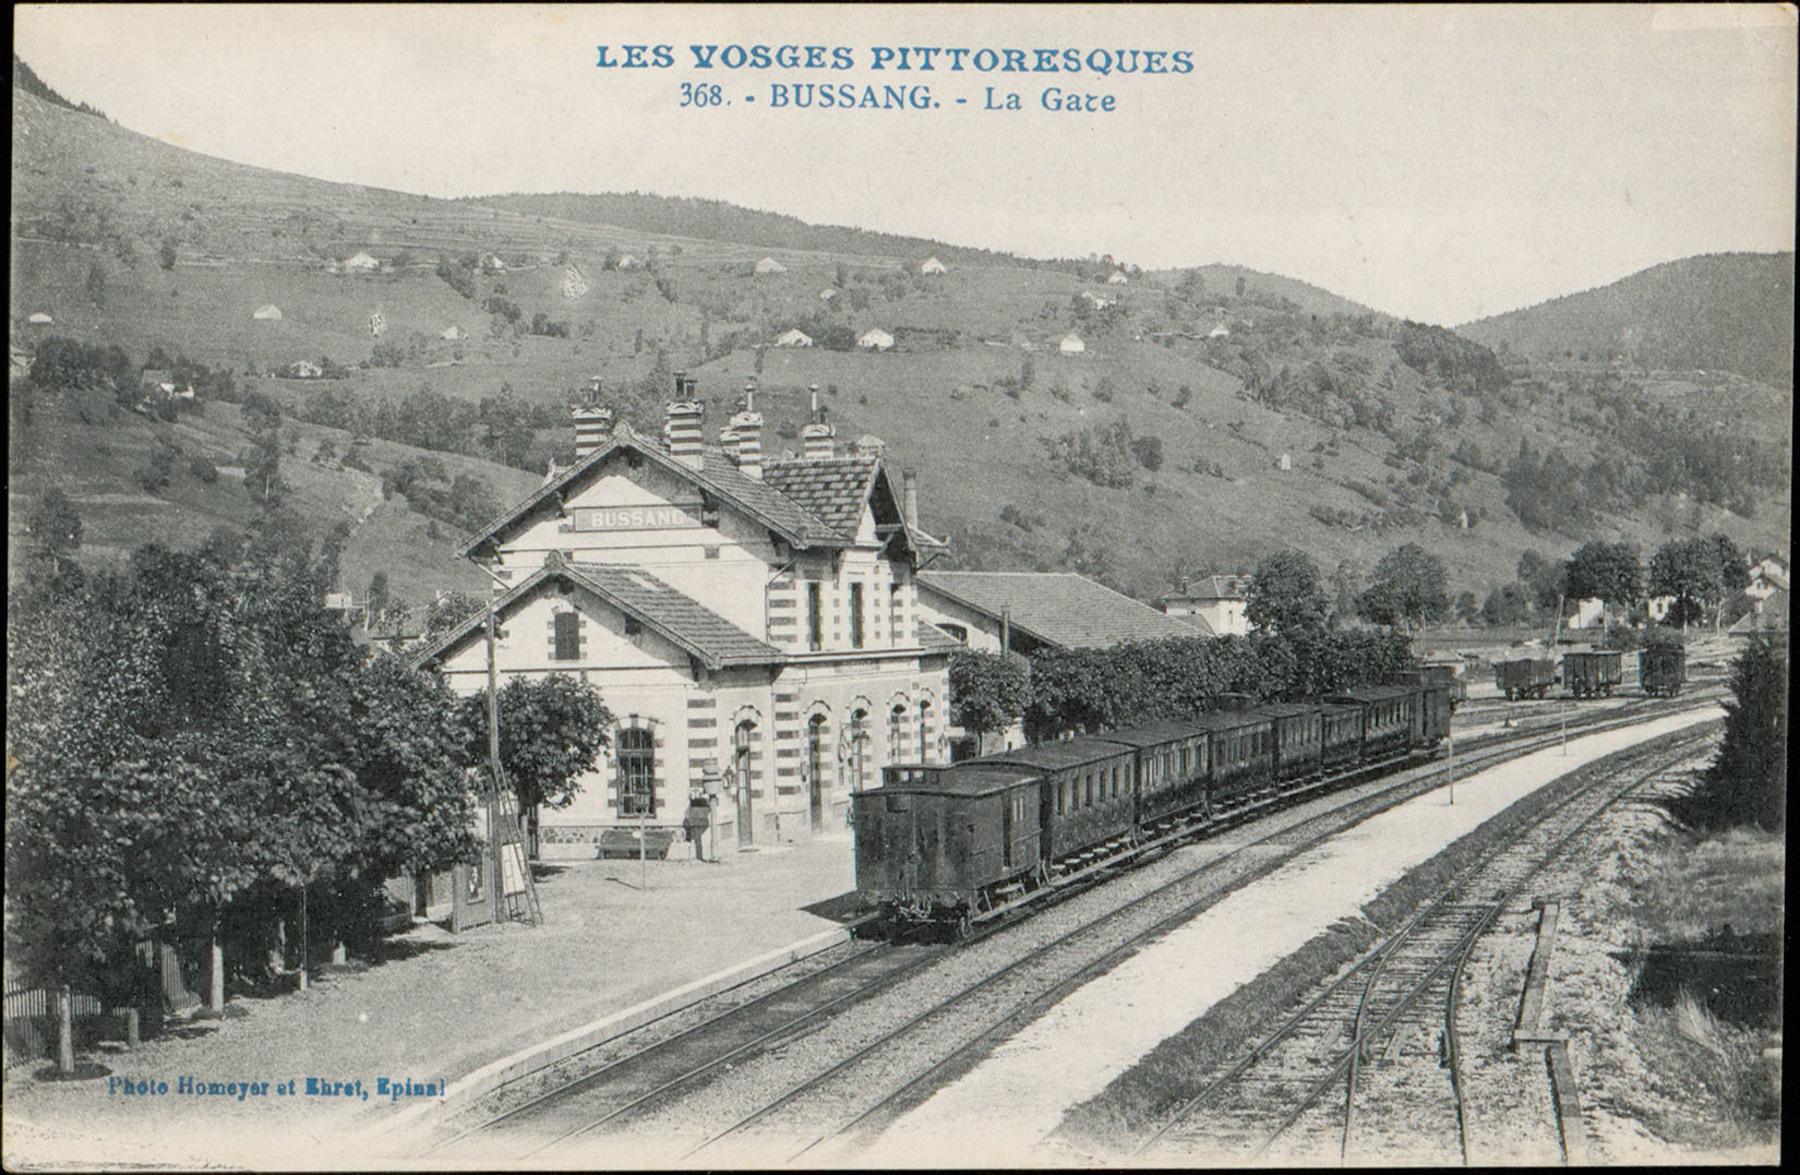 Contenu du Bussang, La Gare